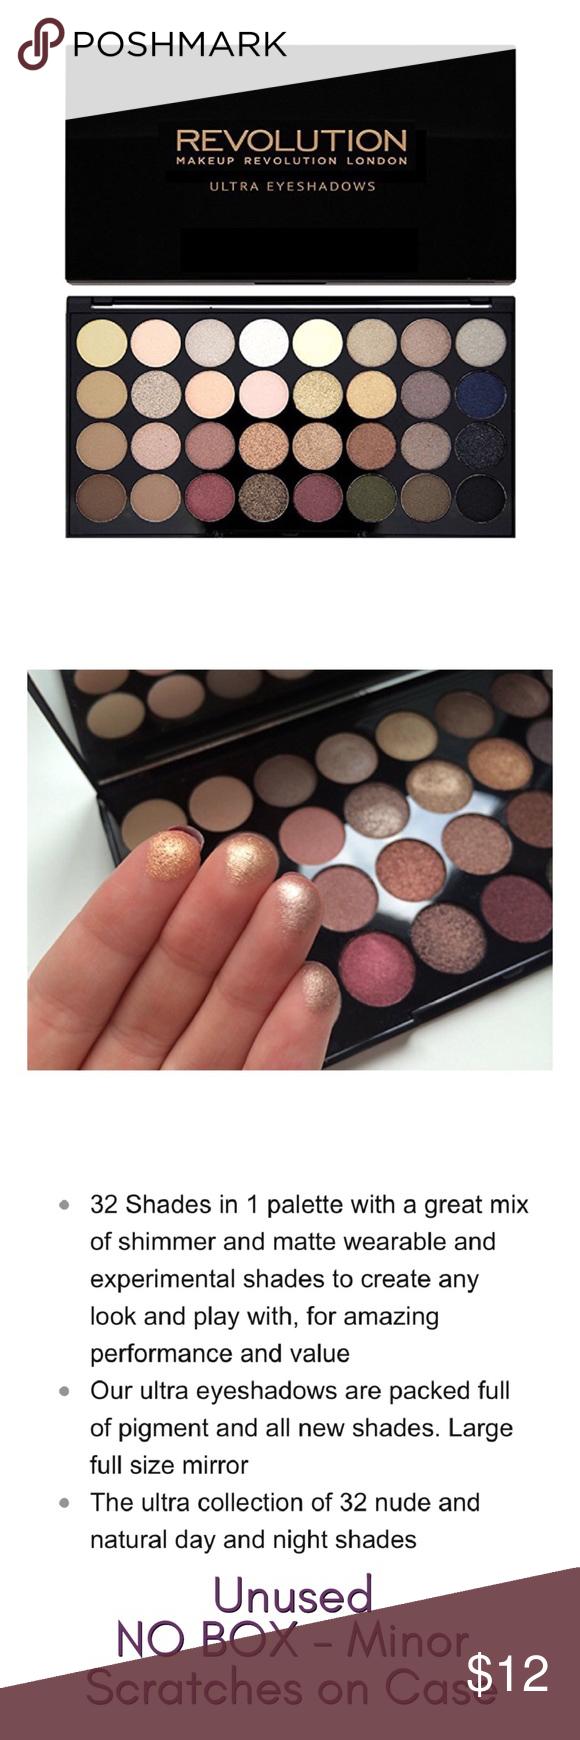 2/20 Makeup Revolution Ultra Eyeshadow Palette Never used